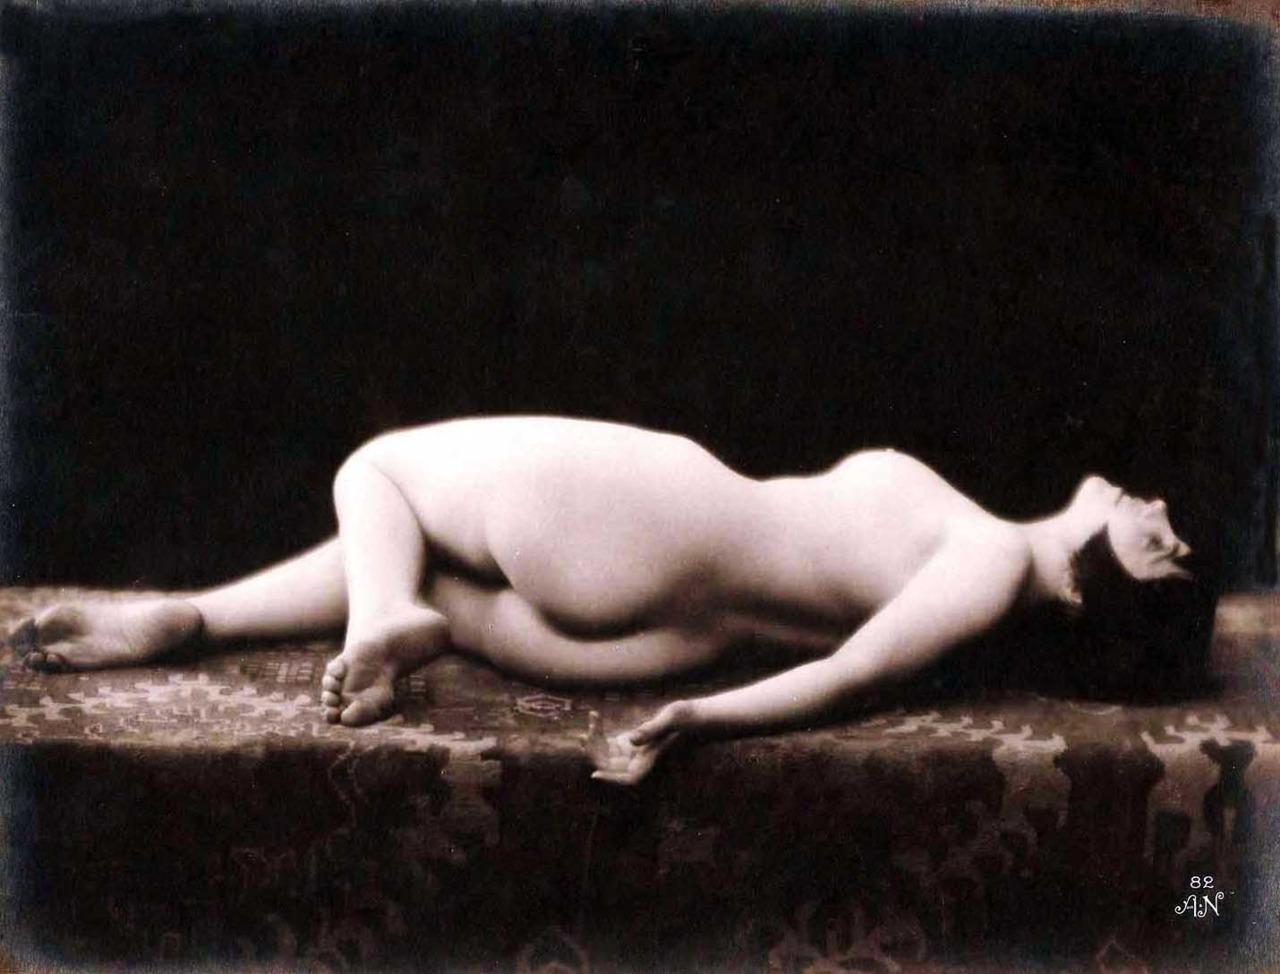 lying back